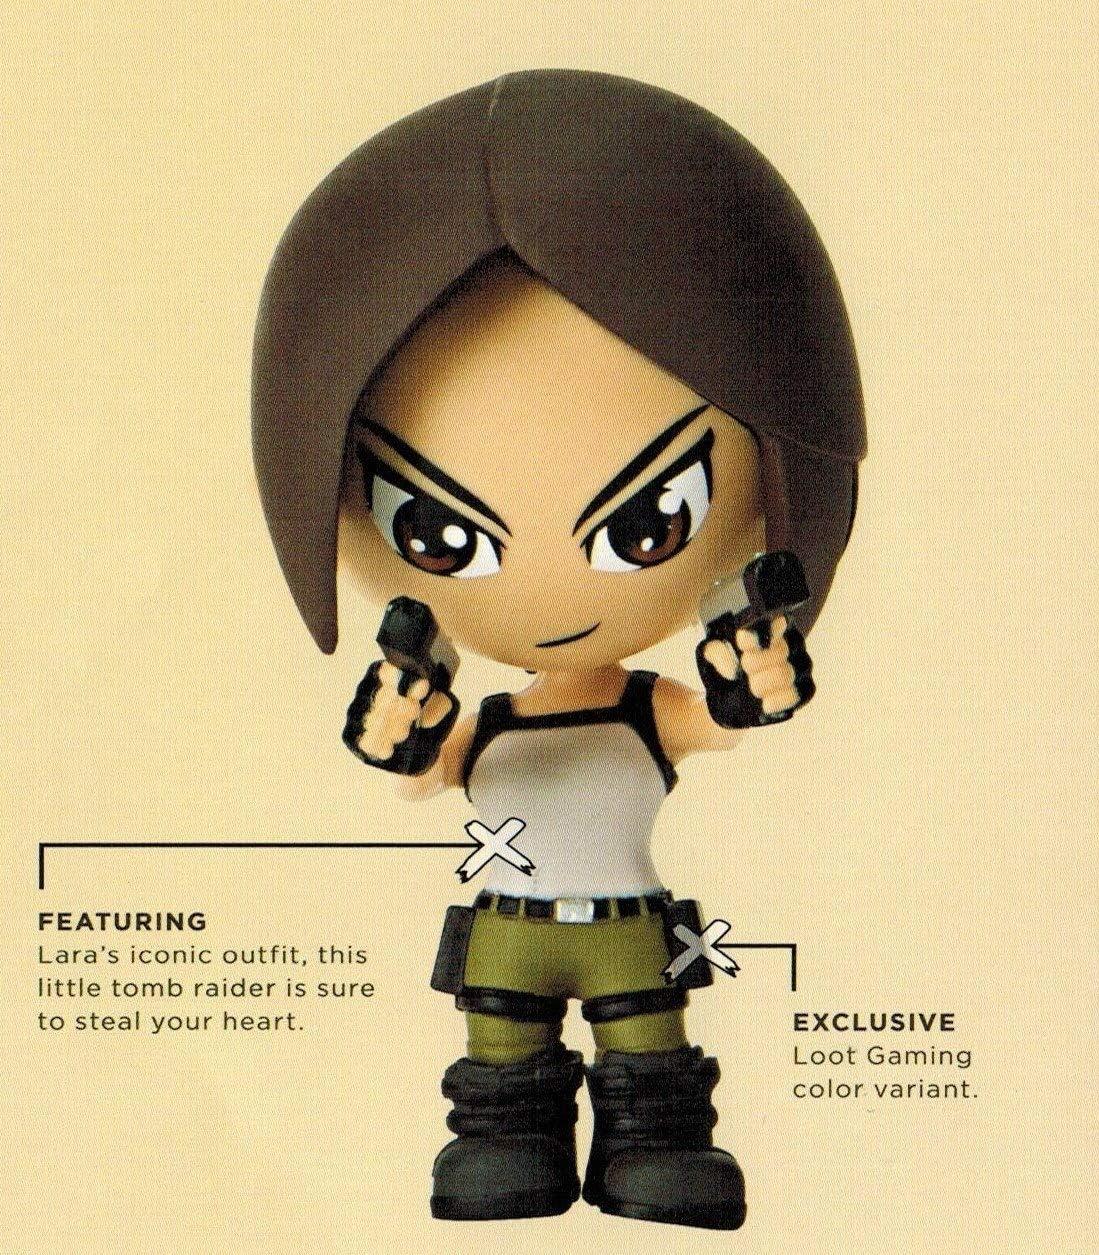 Loot Crate Tomb Raider Lara Croft Exclus SALENEW大人気! 2016 Figure July 本日の目玉 Gaming